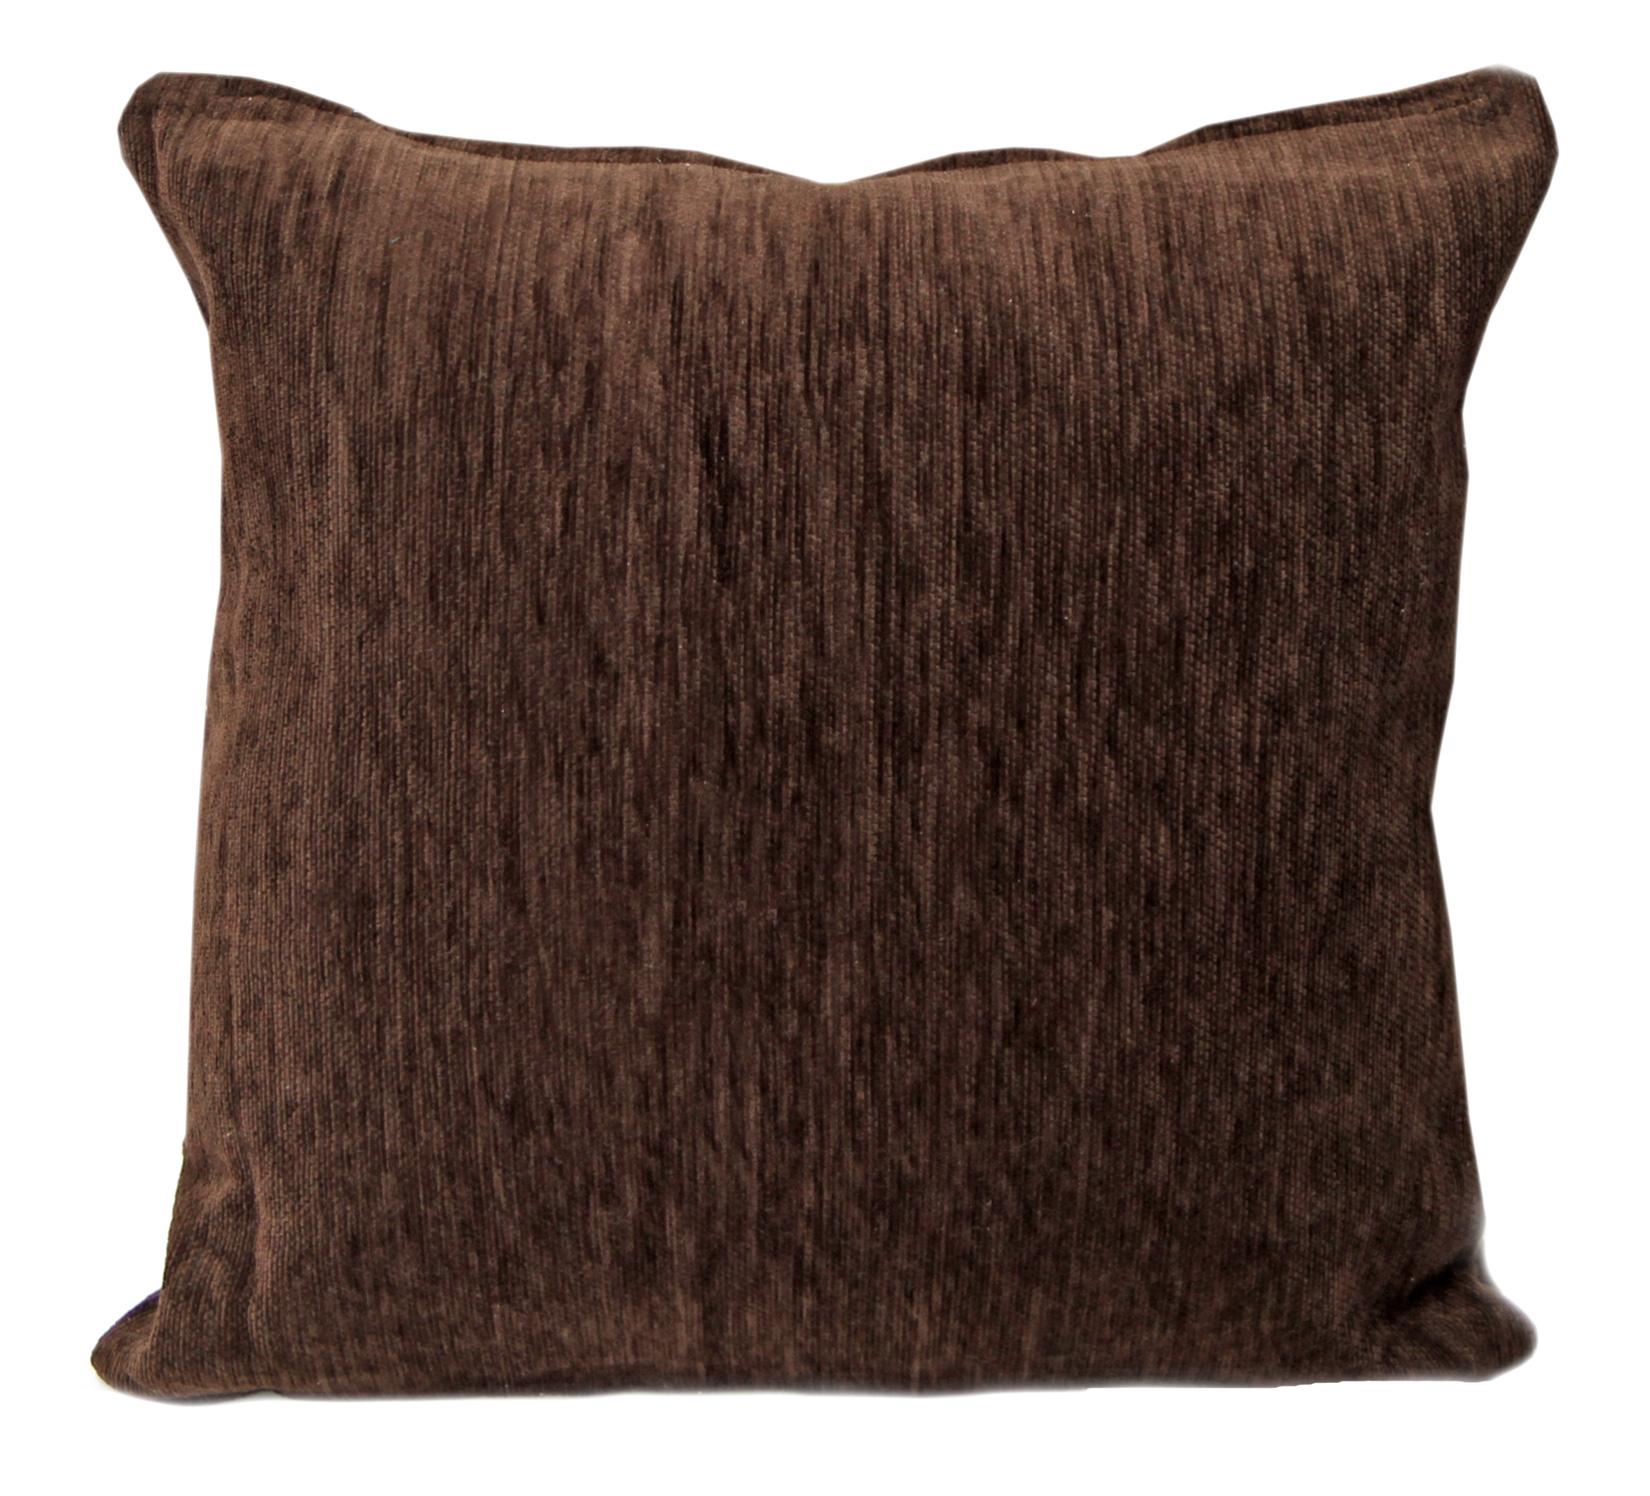 Liso-De-Lujo-Chenilla-Cojines-Super-suave-fundas-de-cojin-43-2cmx43-2cm